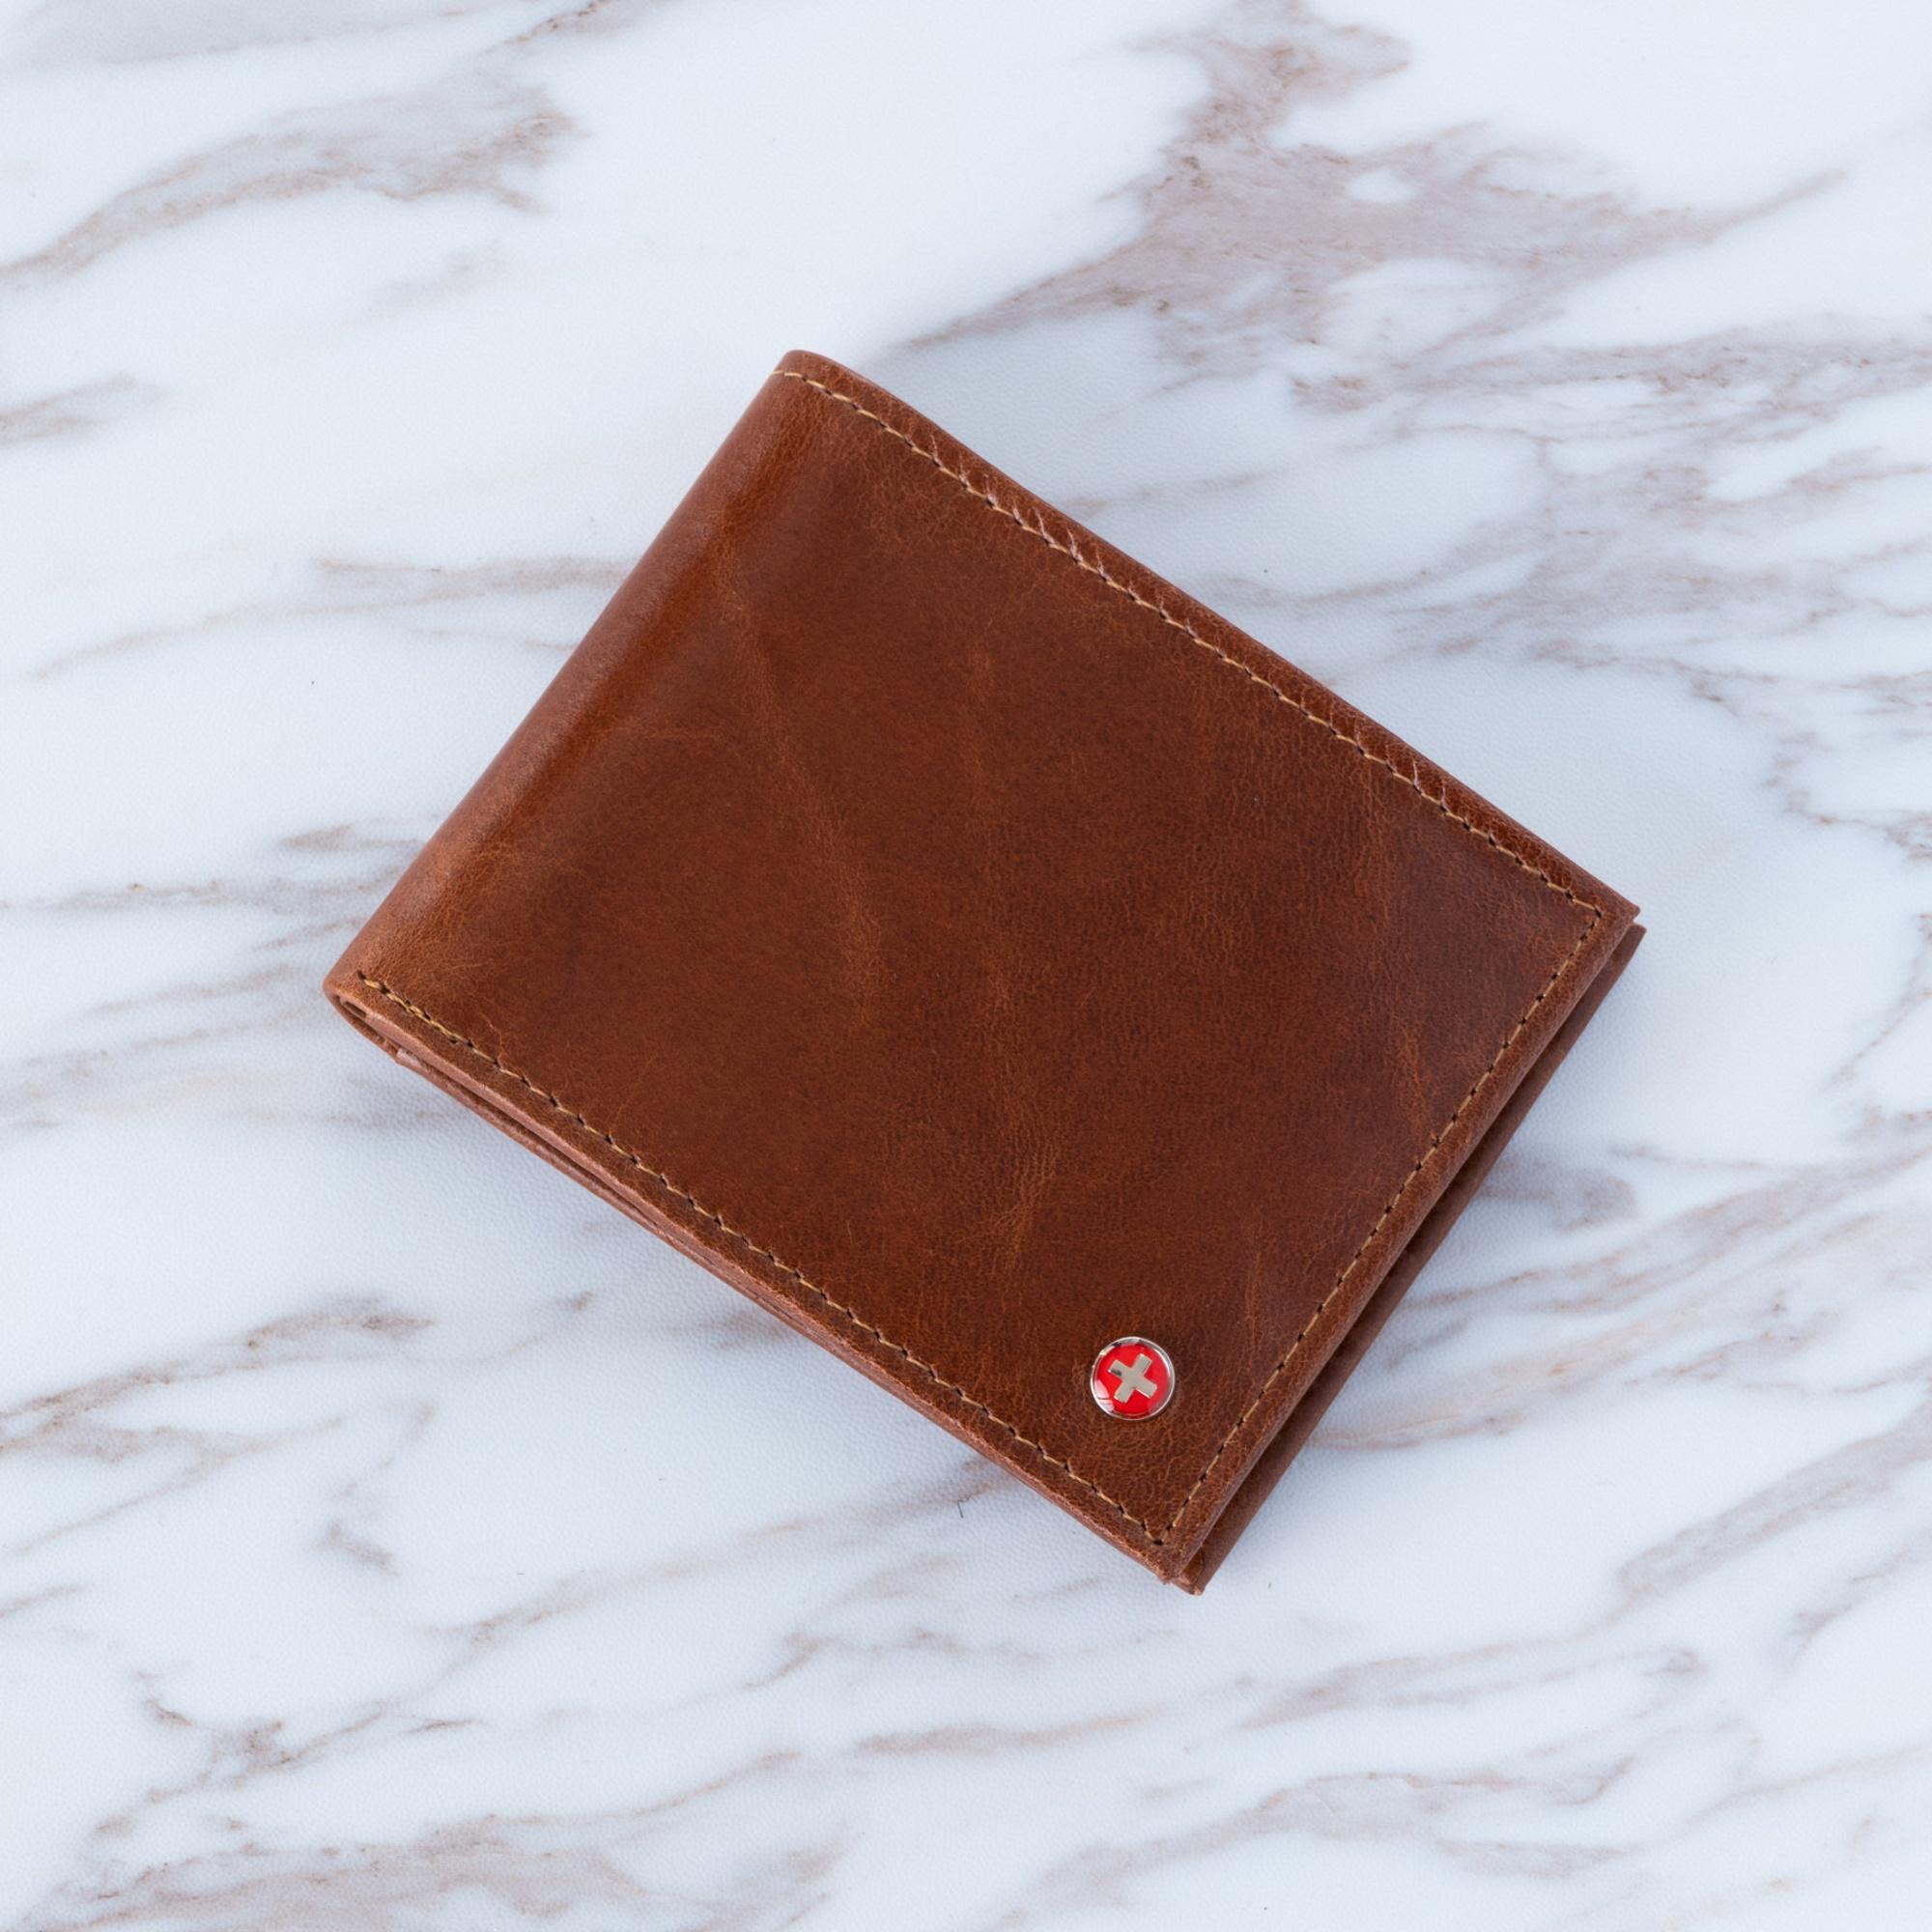 Alpine Swiss Mens RFID Blocking Leather Wallet Multi Card High Capacity Bifold